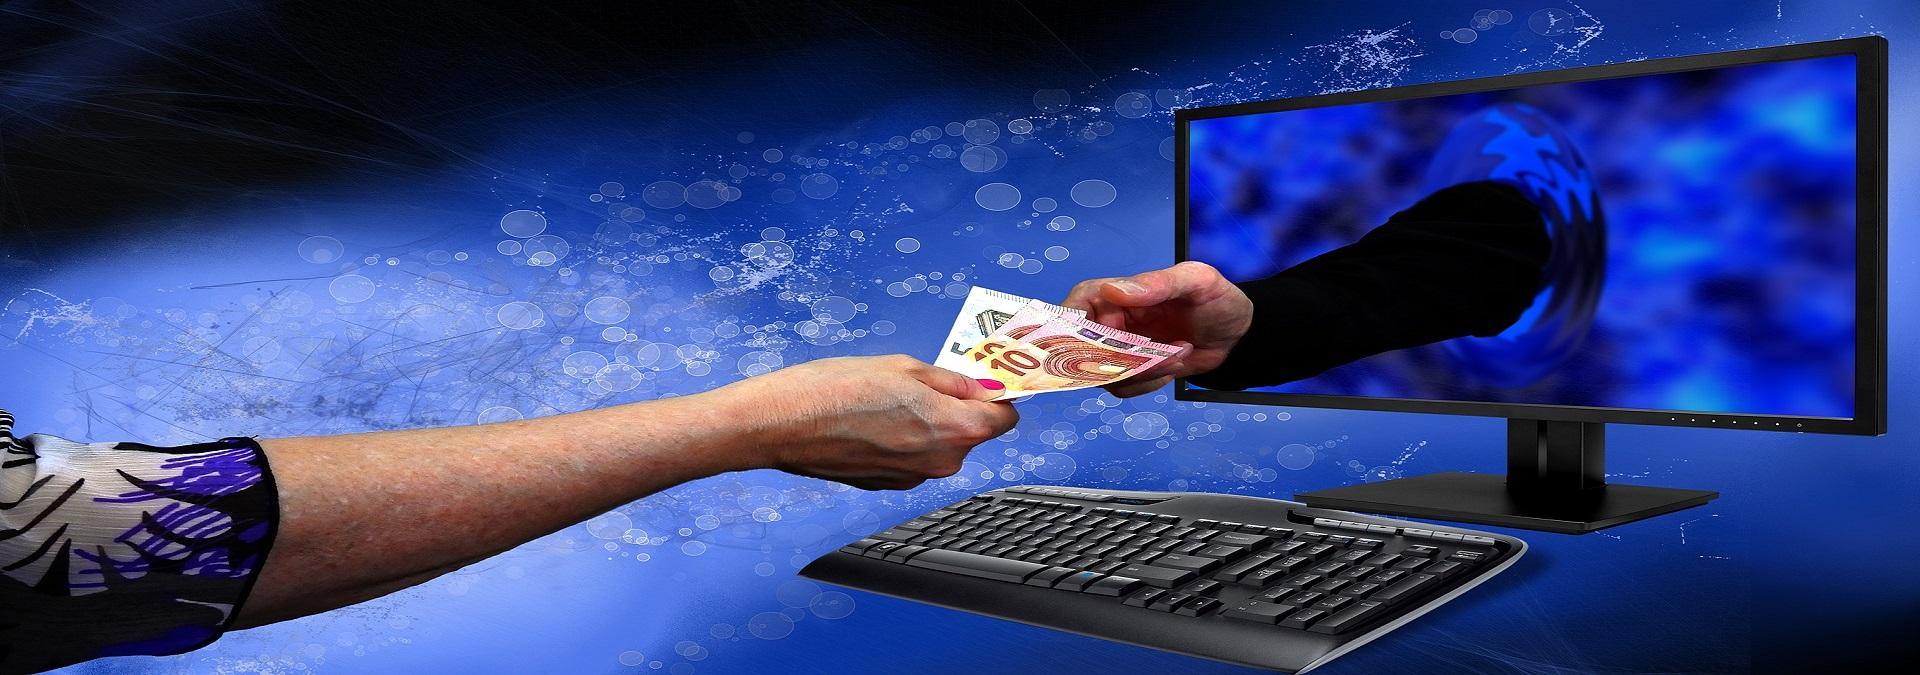 International payment methods facilitate trade between countries.